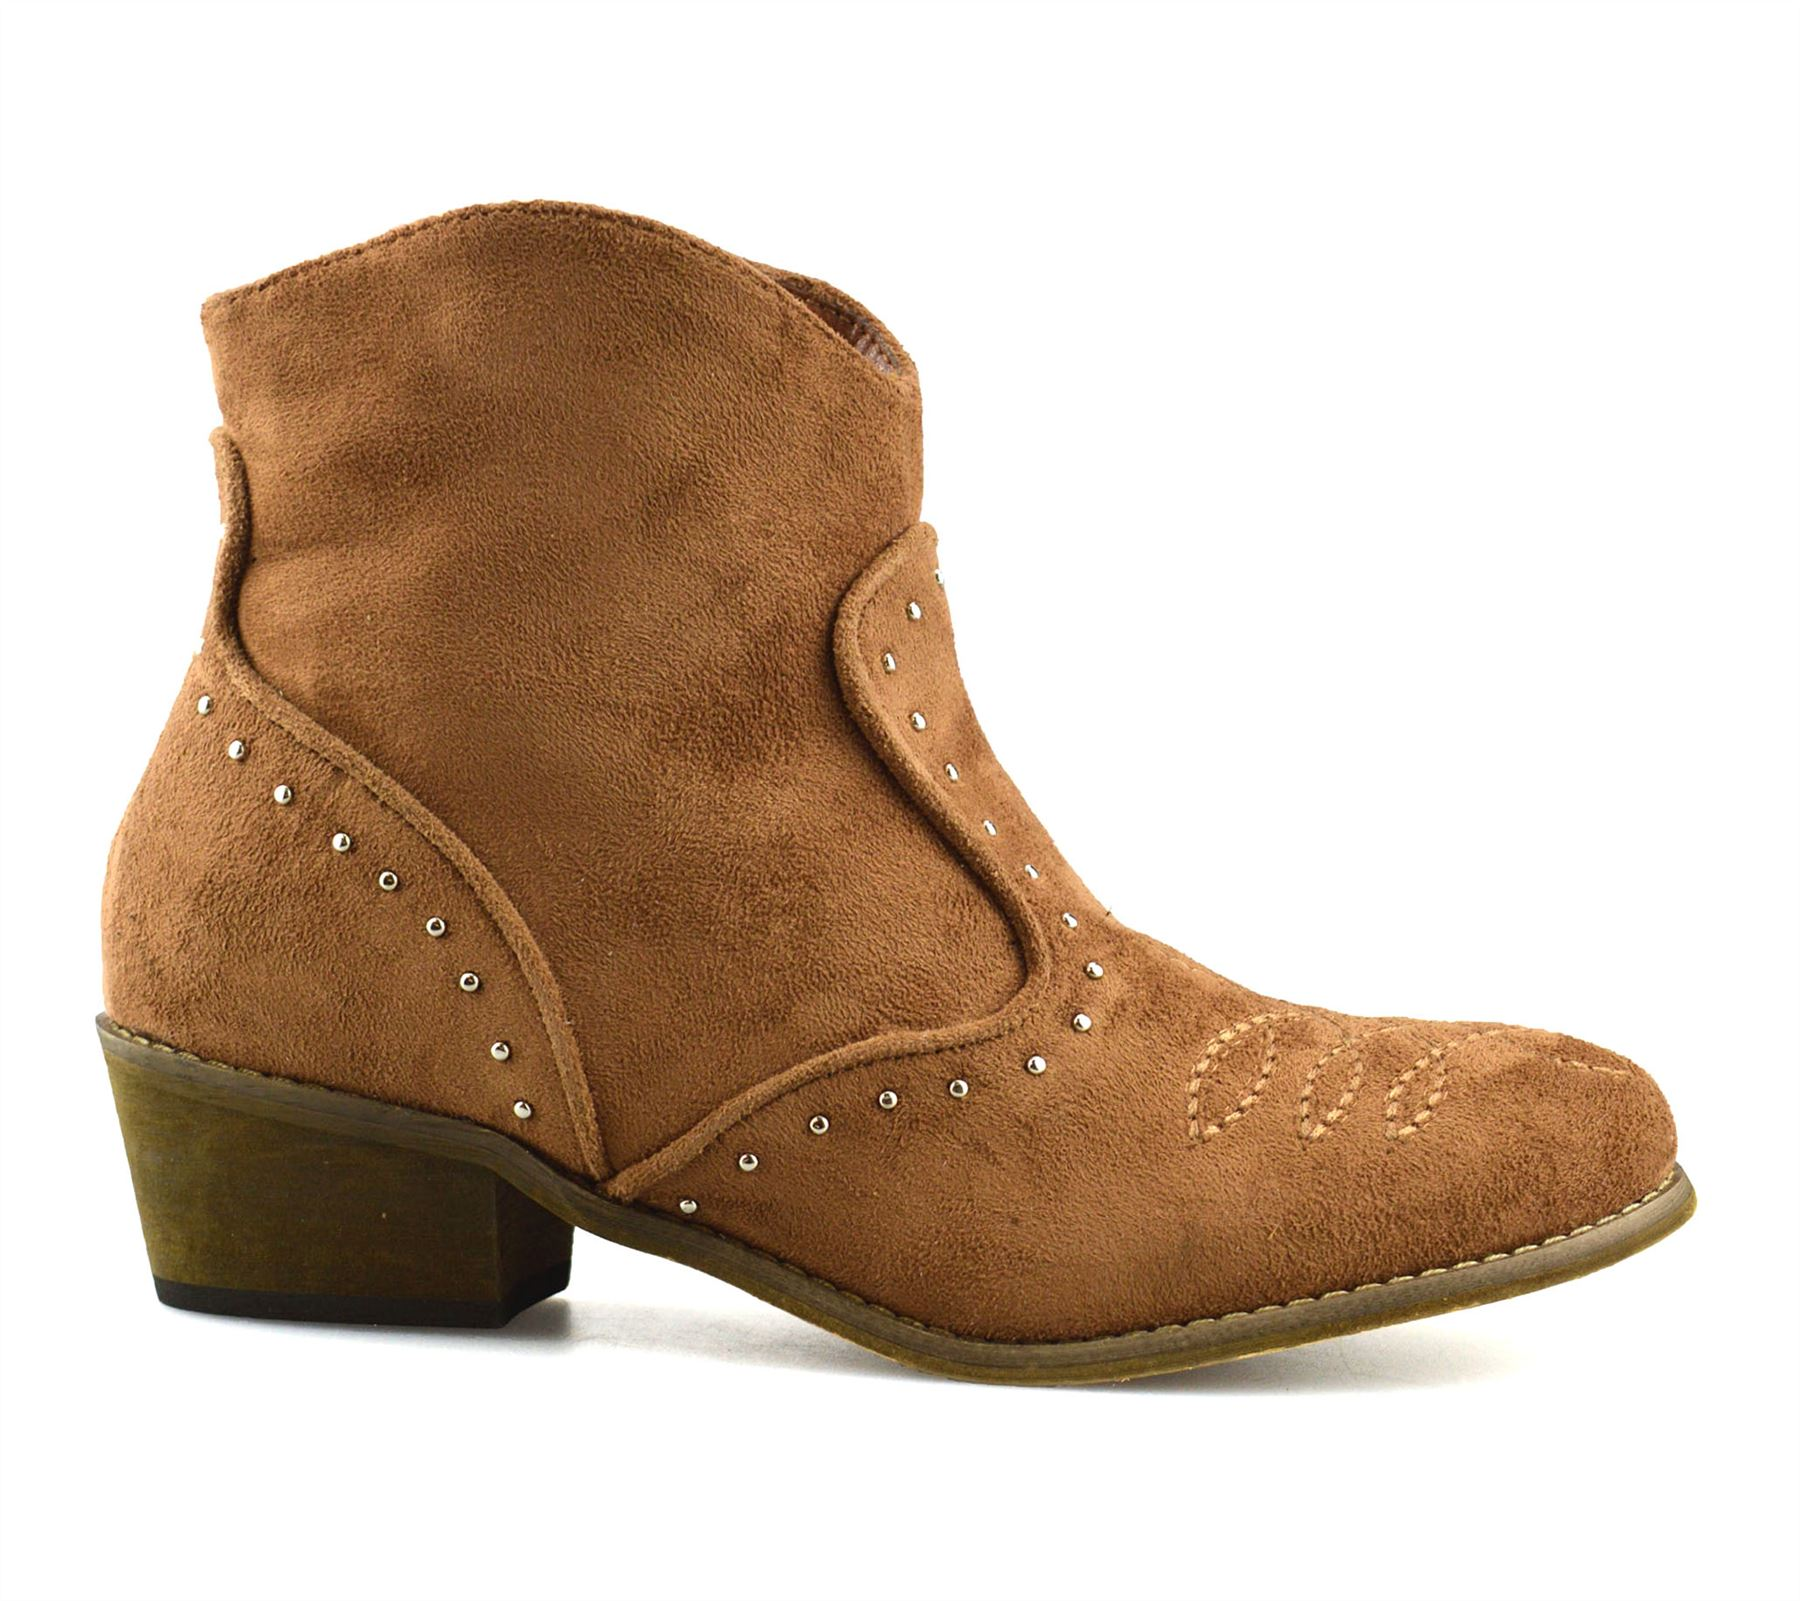 Ladies-Womens-Suede-Mid-Block-Heel-Zip-Up-Ankle-Cowboy-Biker-Boots-Shoes-Size thumbnail 18